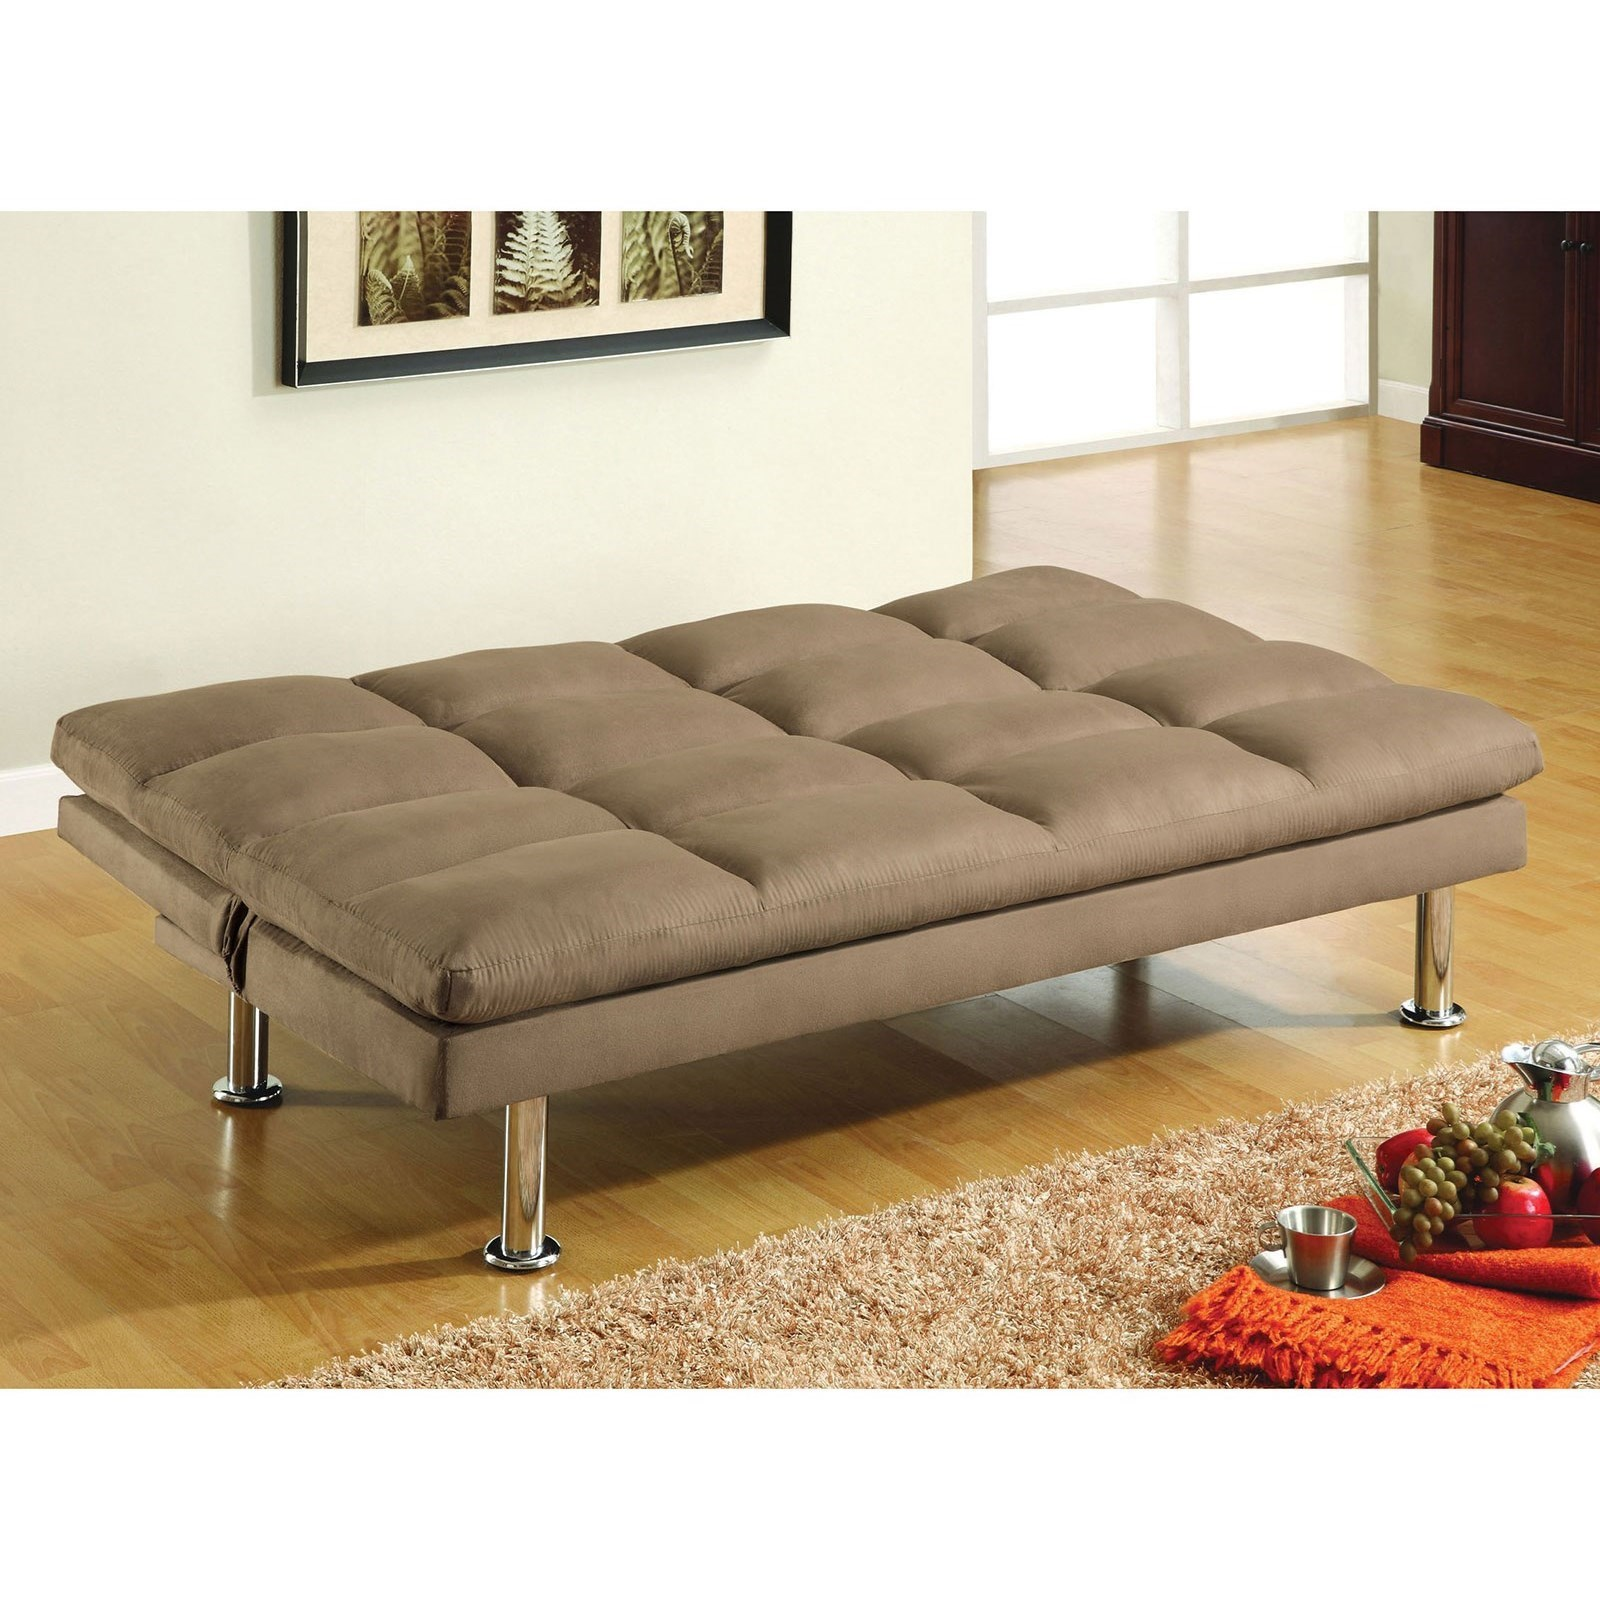 Furniture Of America Saratoga Microfiber Futon Sofa Light